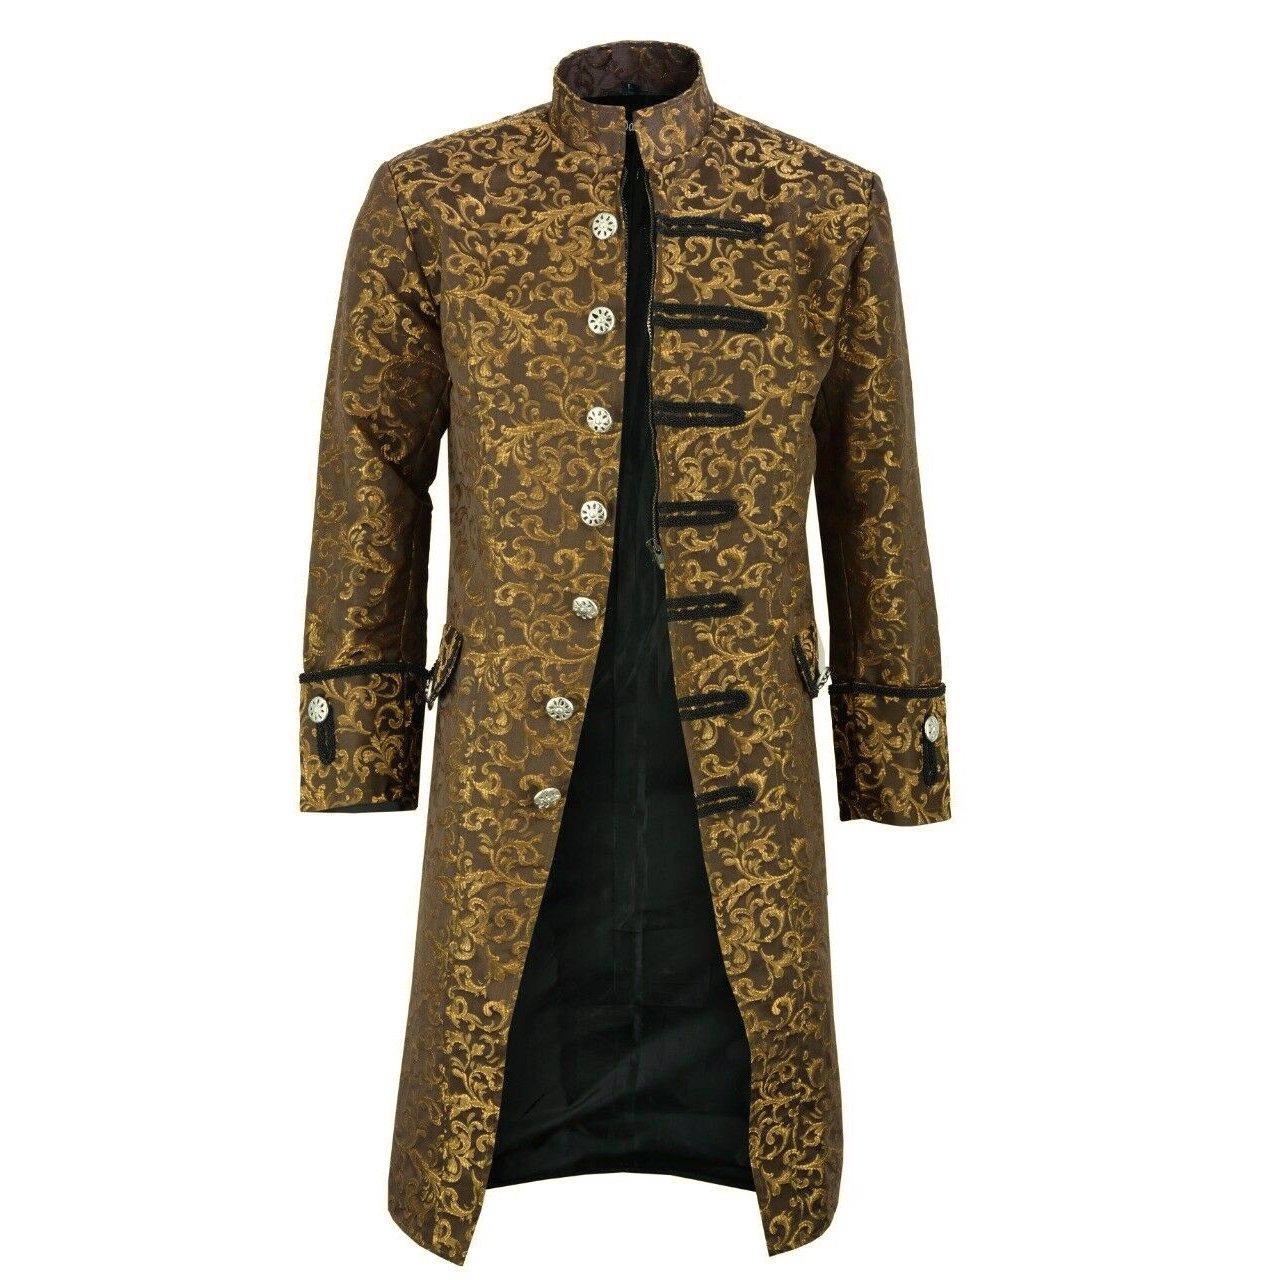 dark rock Renaissance Men's Gold Brocade Goth Steampunk Victorian Velvet Frock Coat (2)